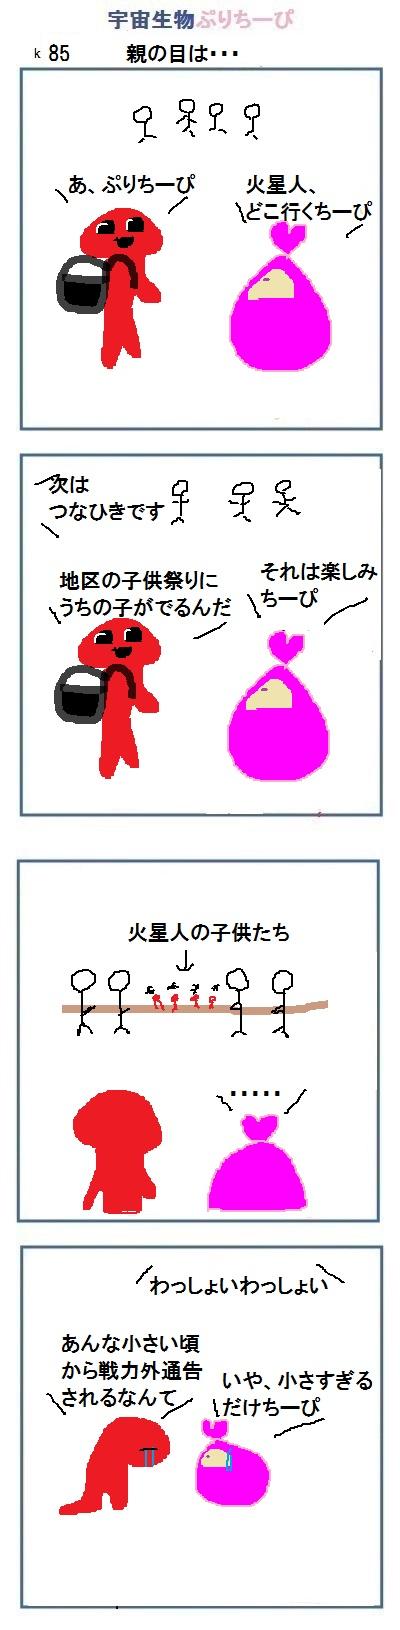 160829_k85.jpg